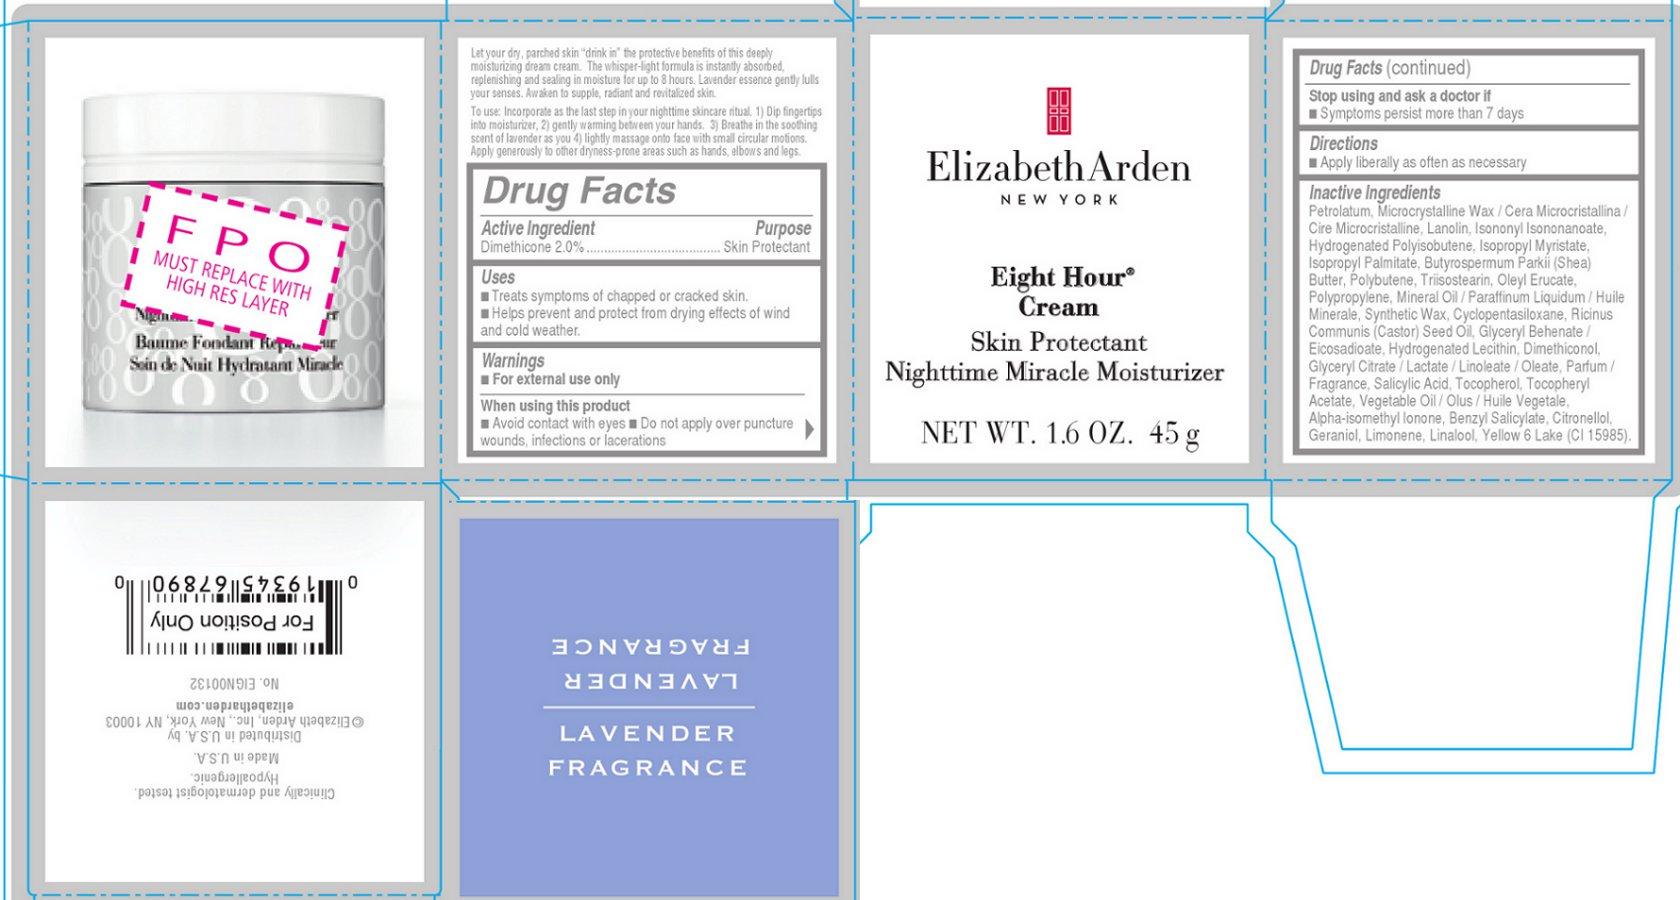 Eight Hour Cream Skin Protectant Nighttime Miracle Moisturizer (Dimethicone) Cream [Elizabeth Arden, Inc]